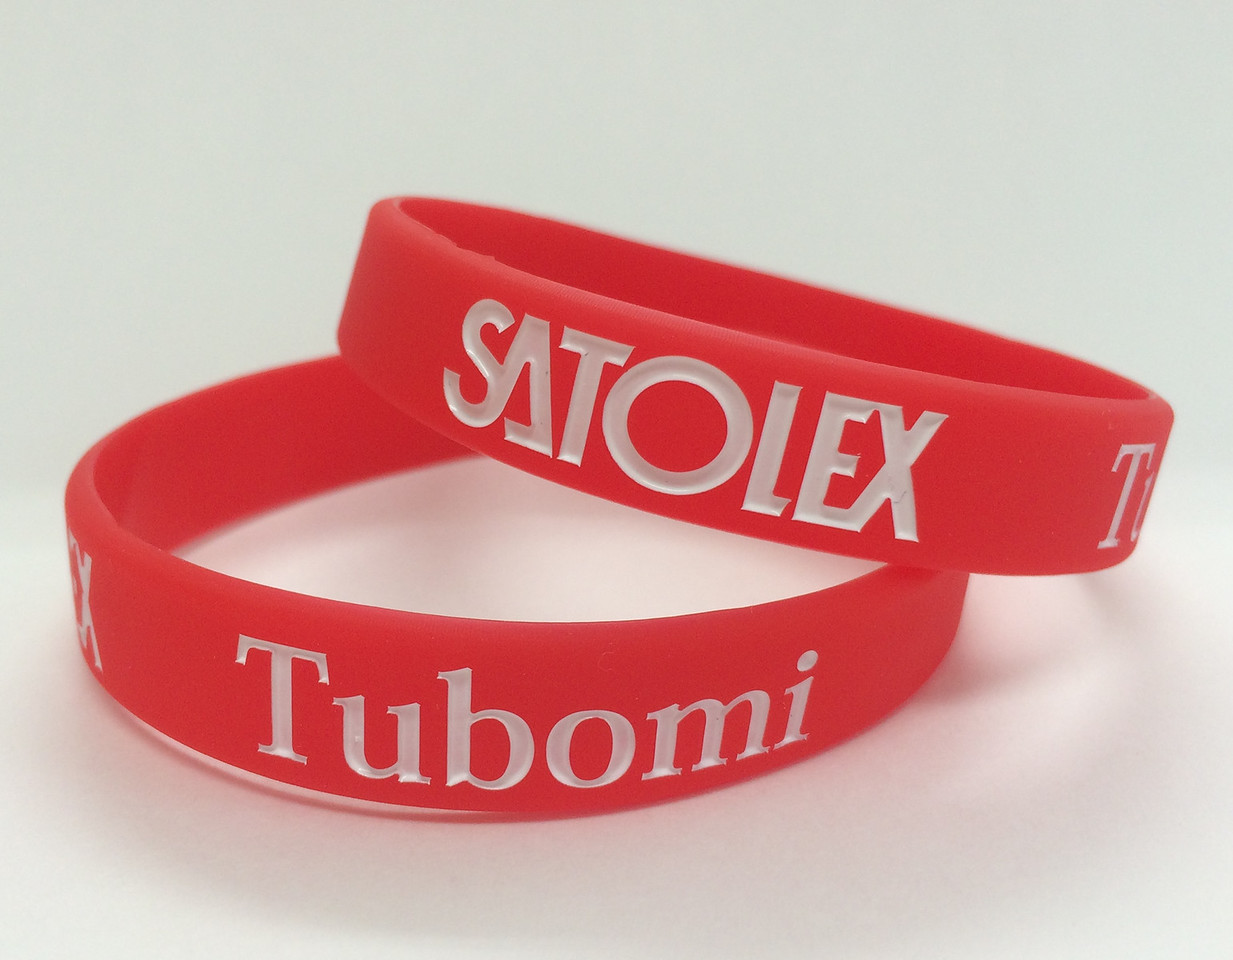 SATOLEX Tubomi リストバンド